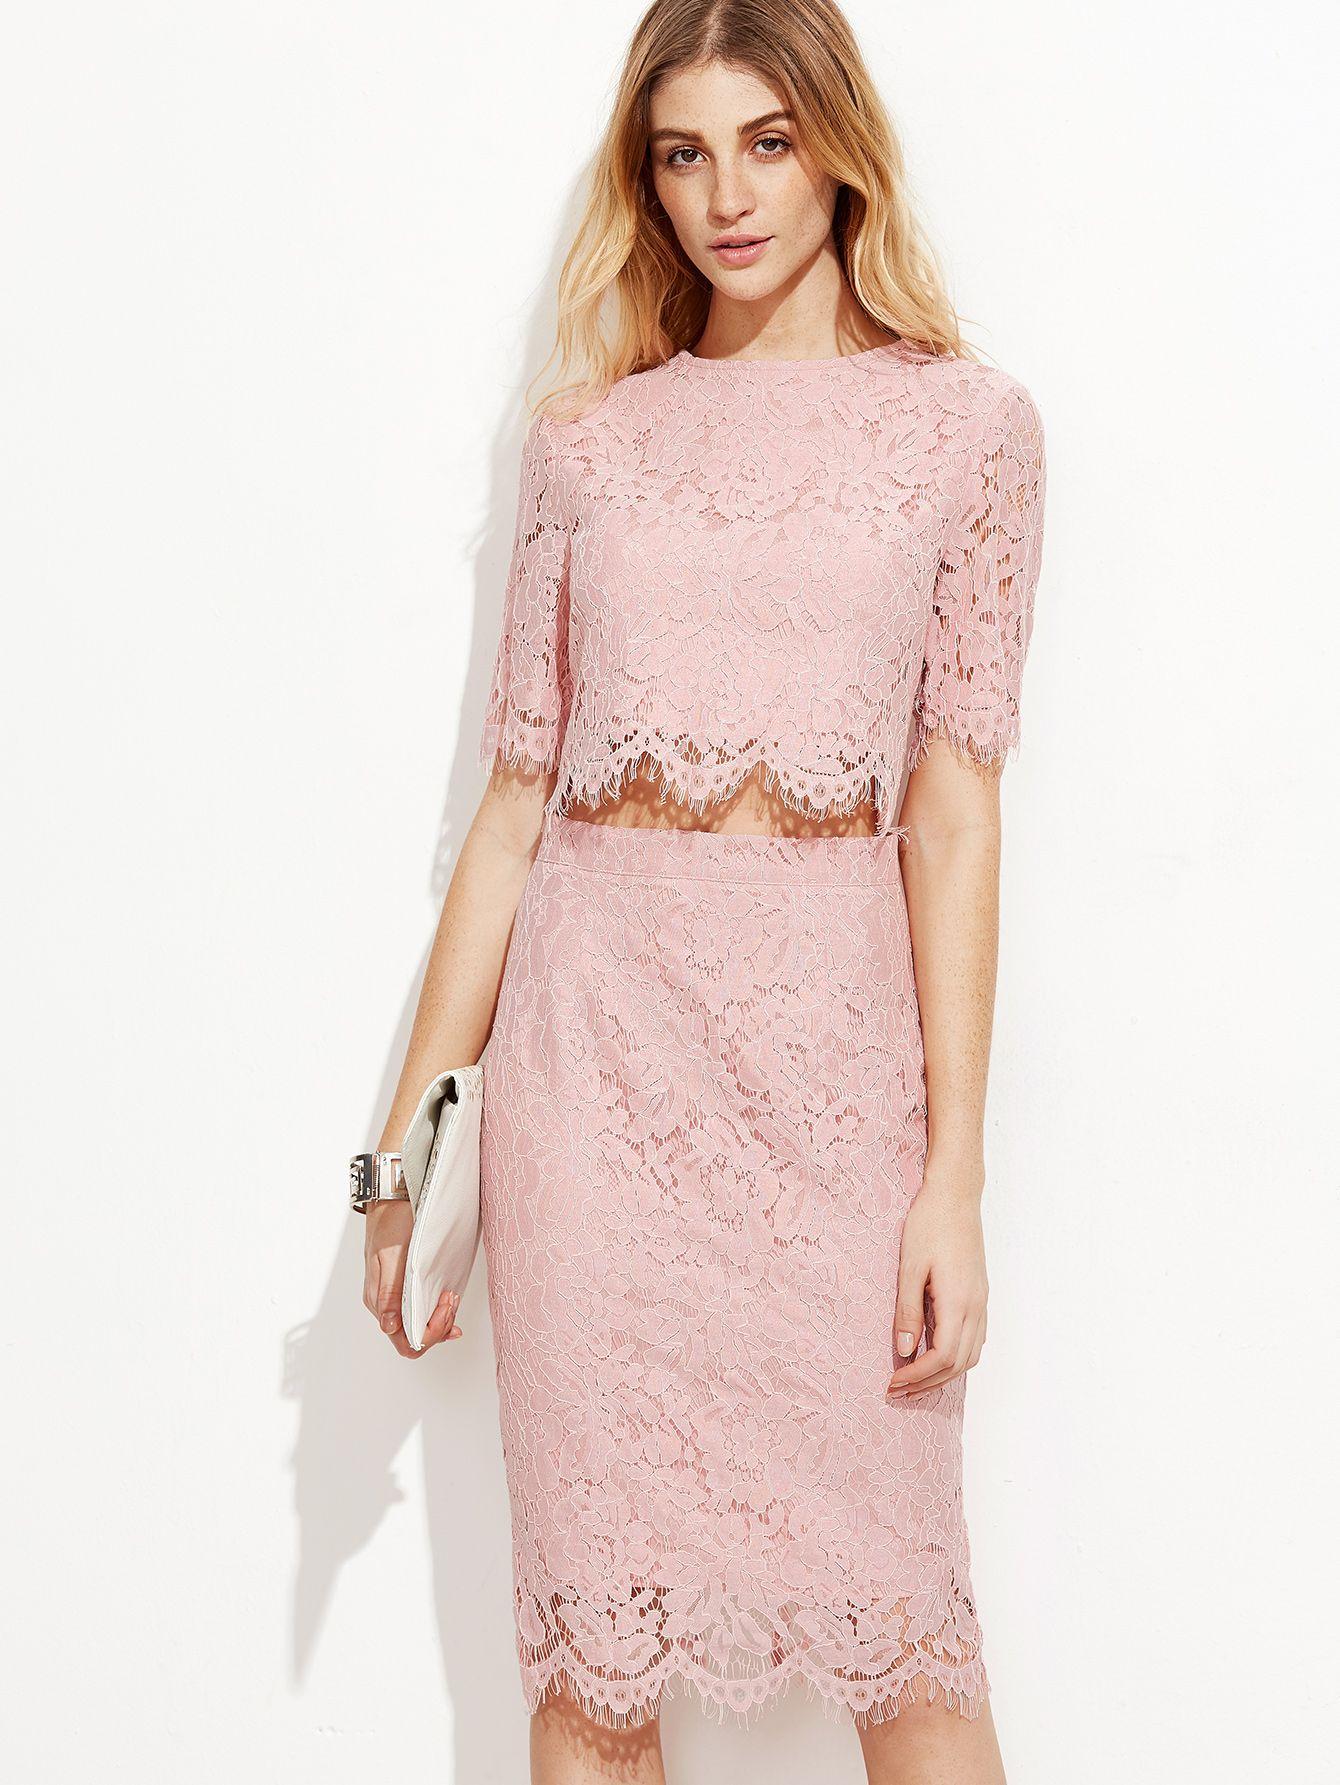 cc0de4d7ee8 Shop Pink Open Midriff Floral Lace Dress online. SheIn offers Pink ...